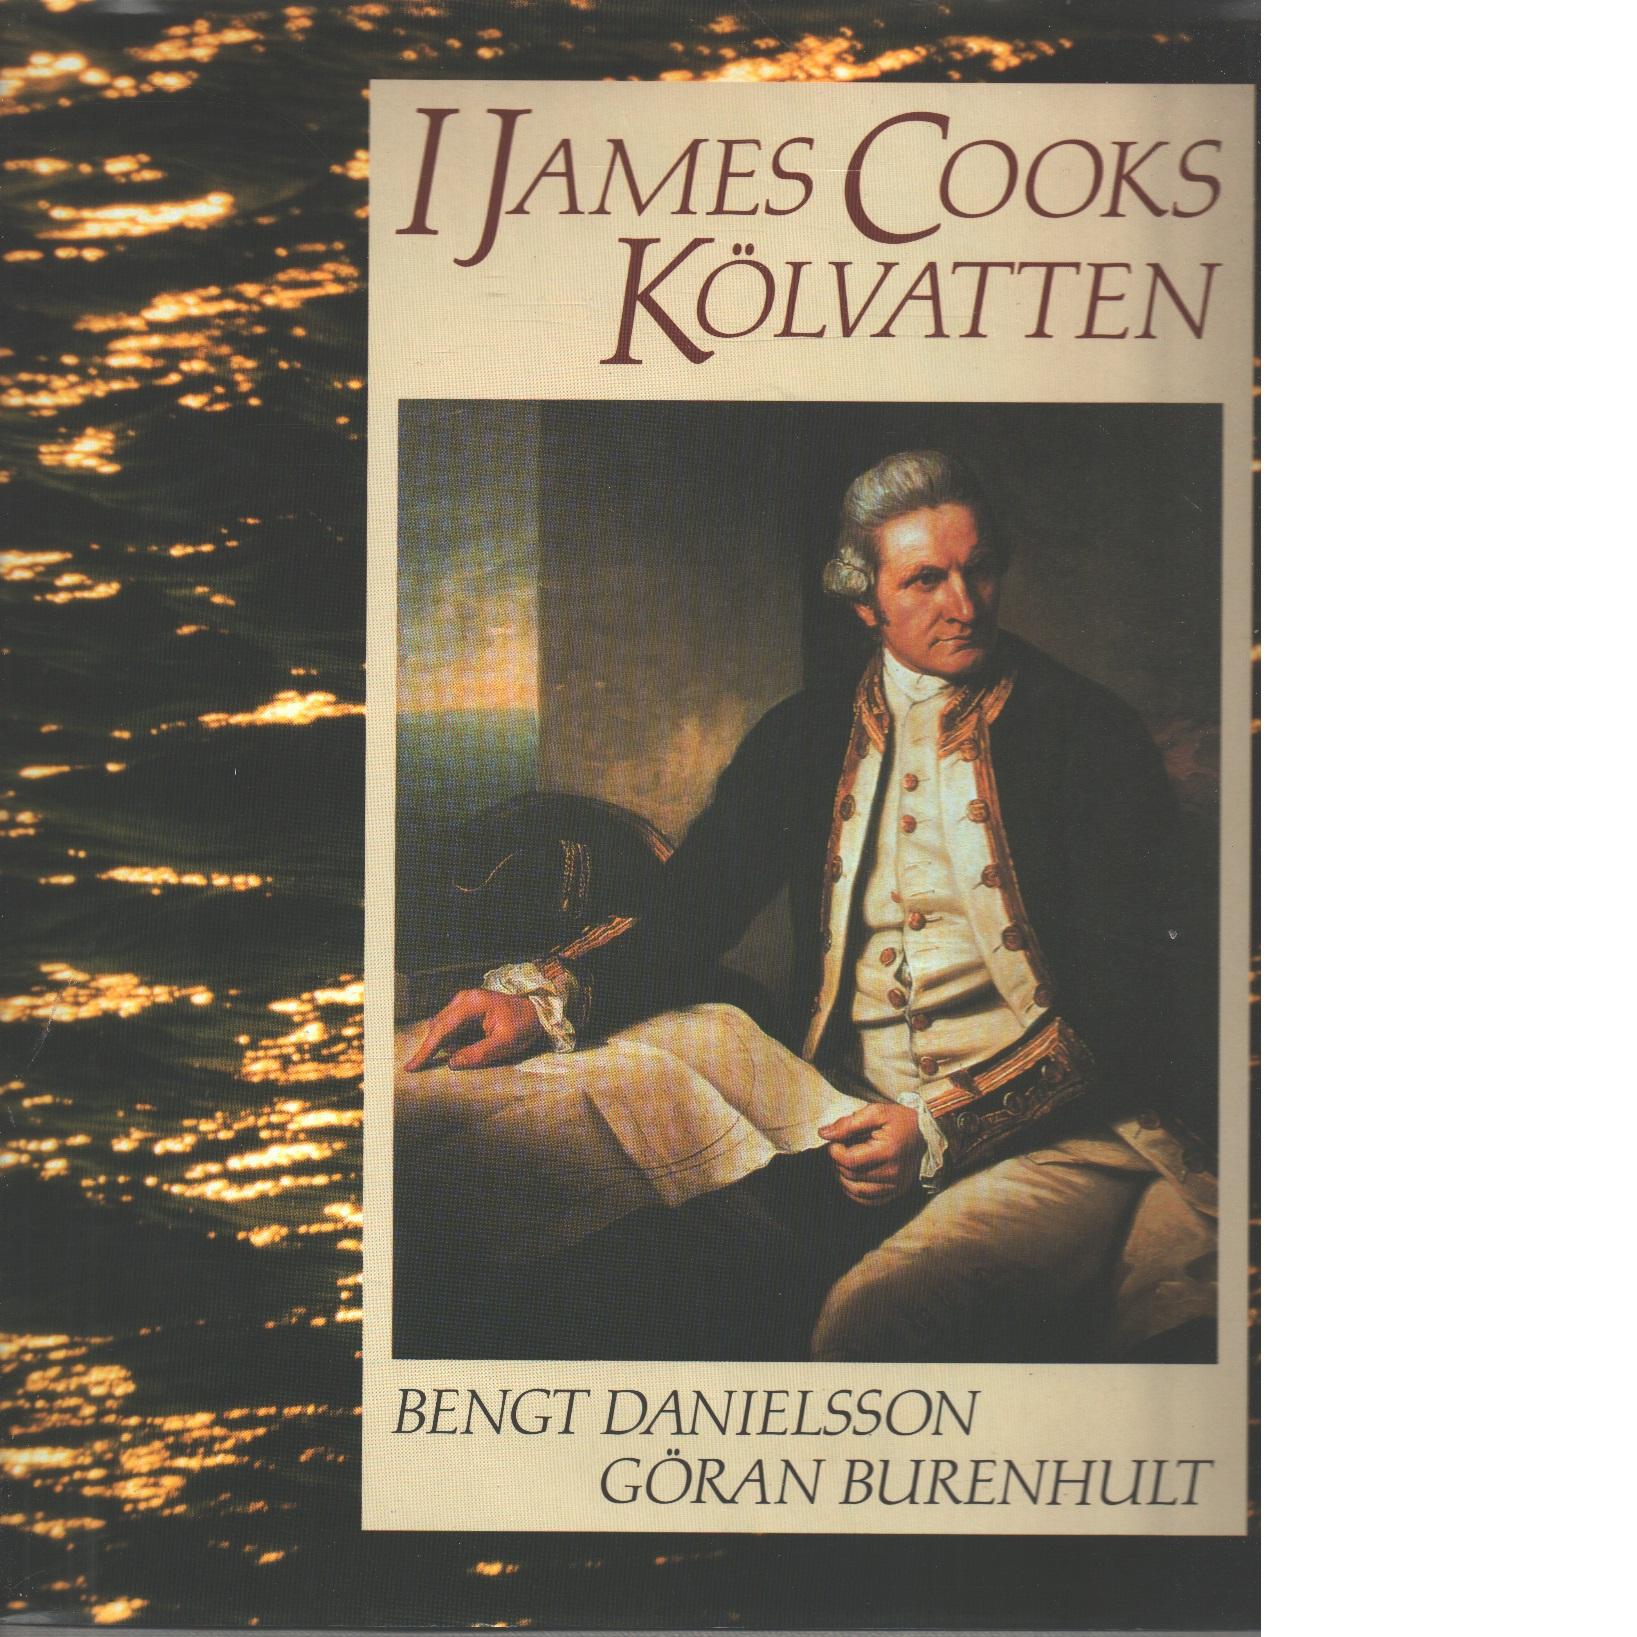 I James Cooks kölvatten - Danielsson, Bengt